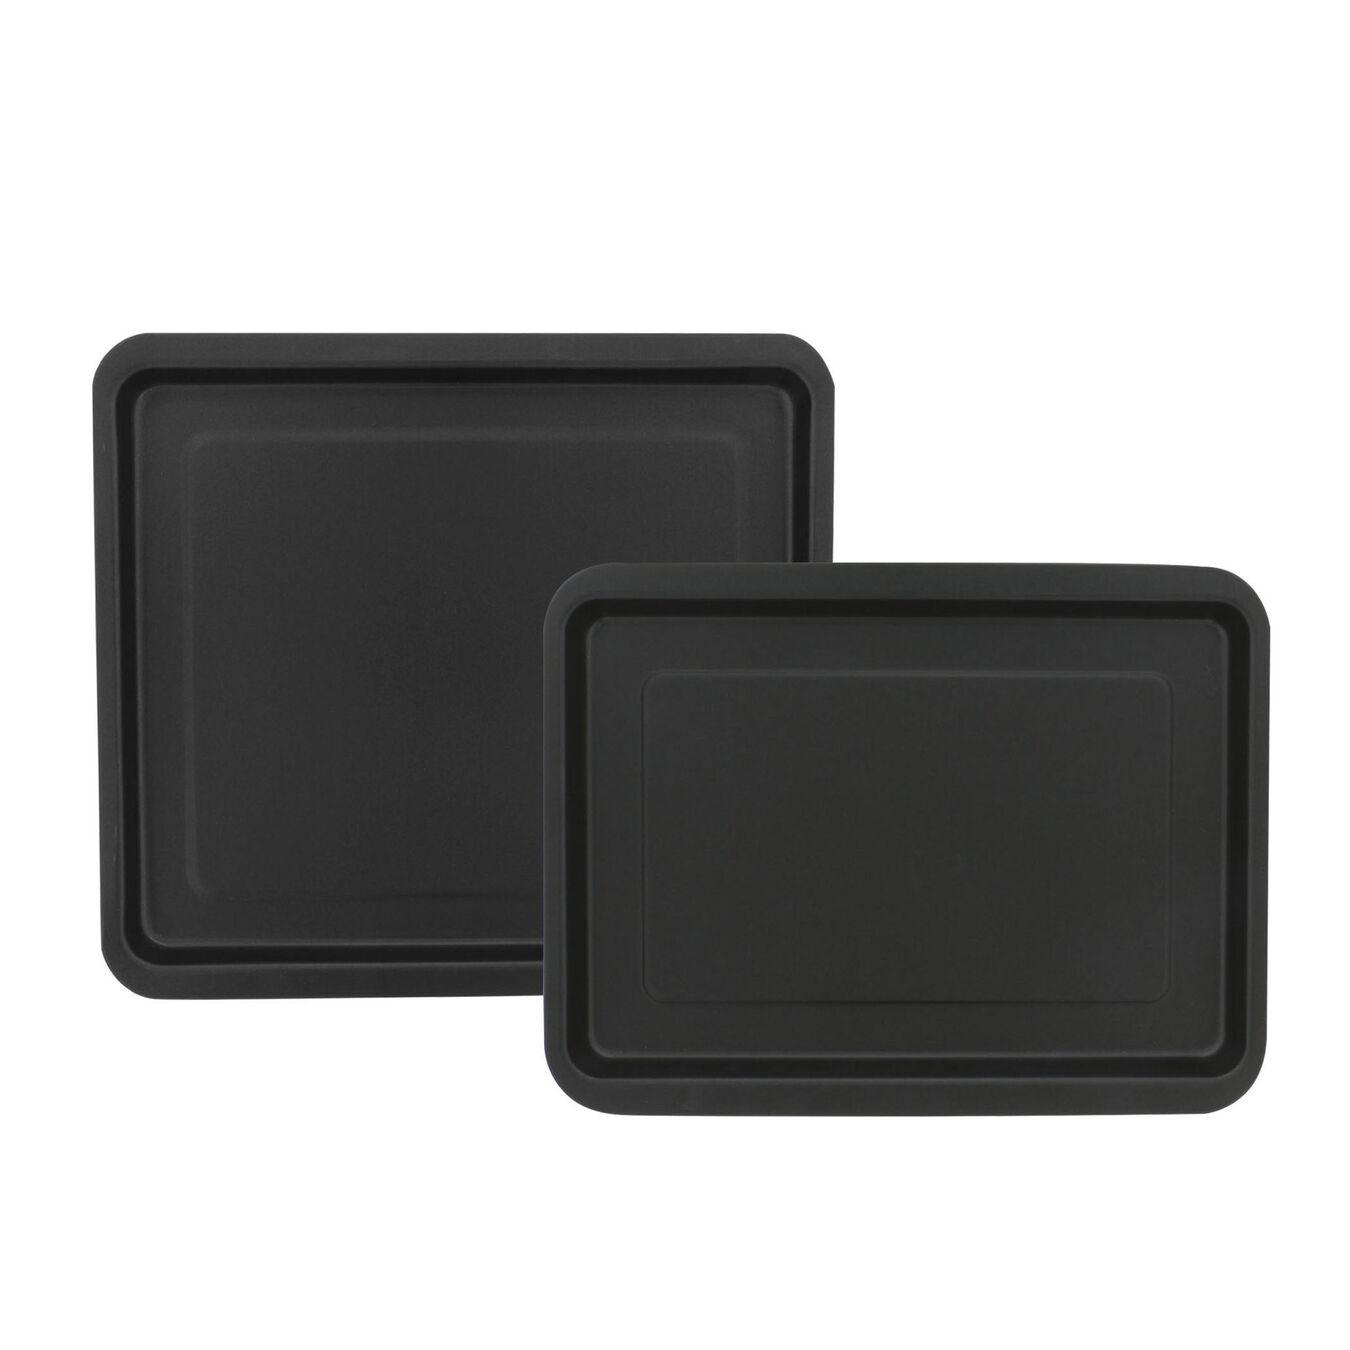 2-pcBakeware set,,large 1